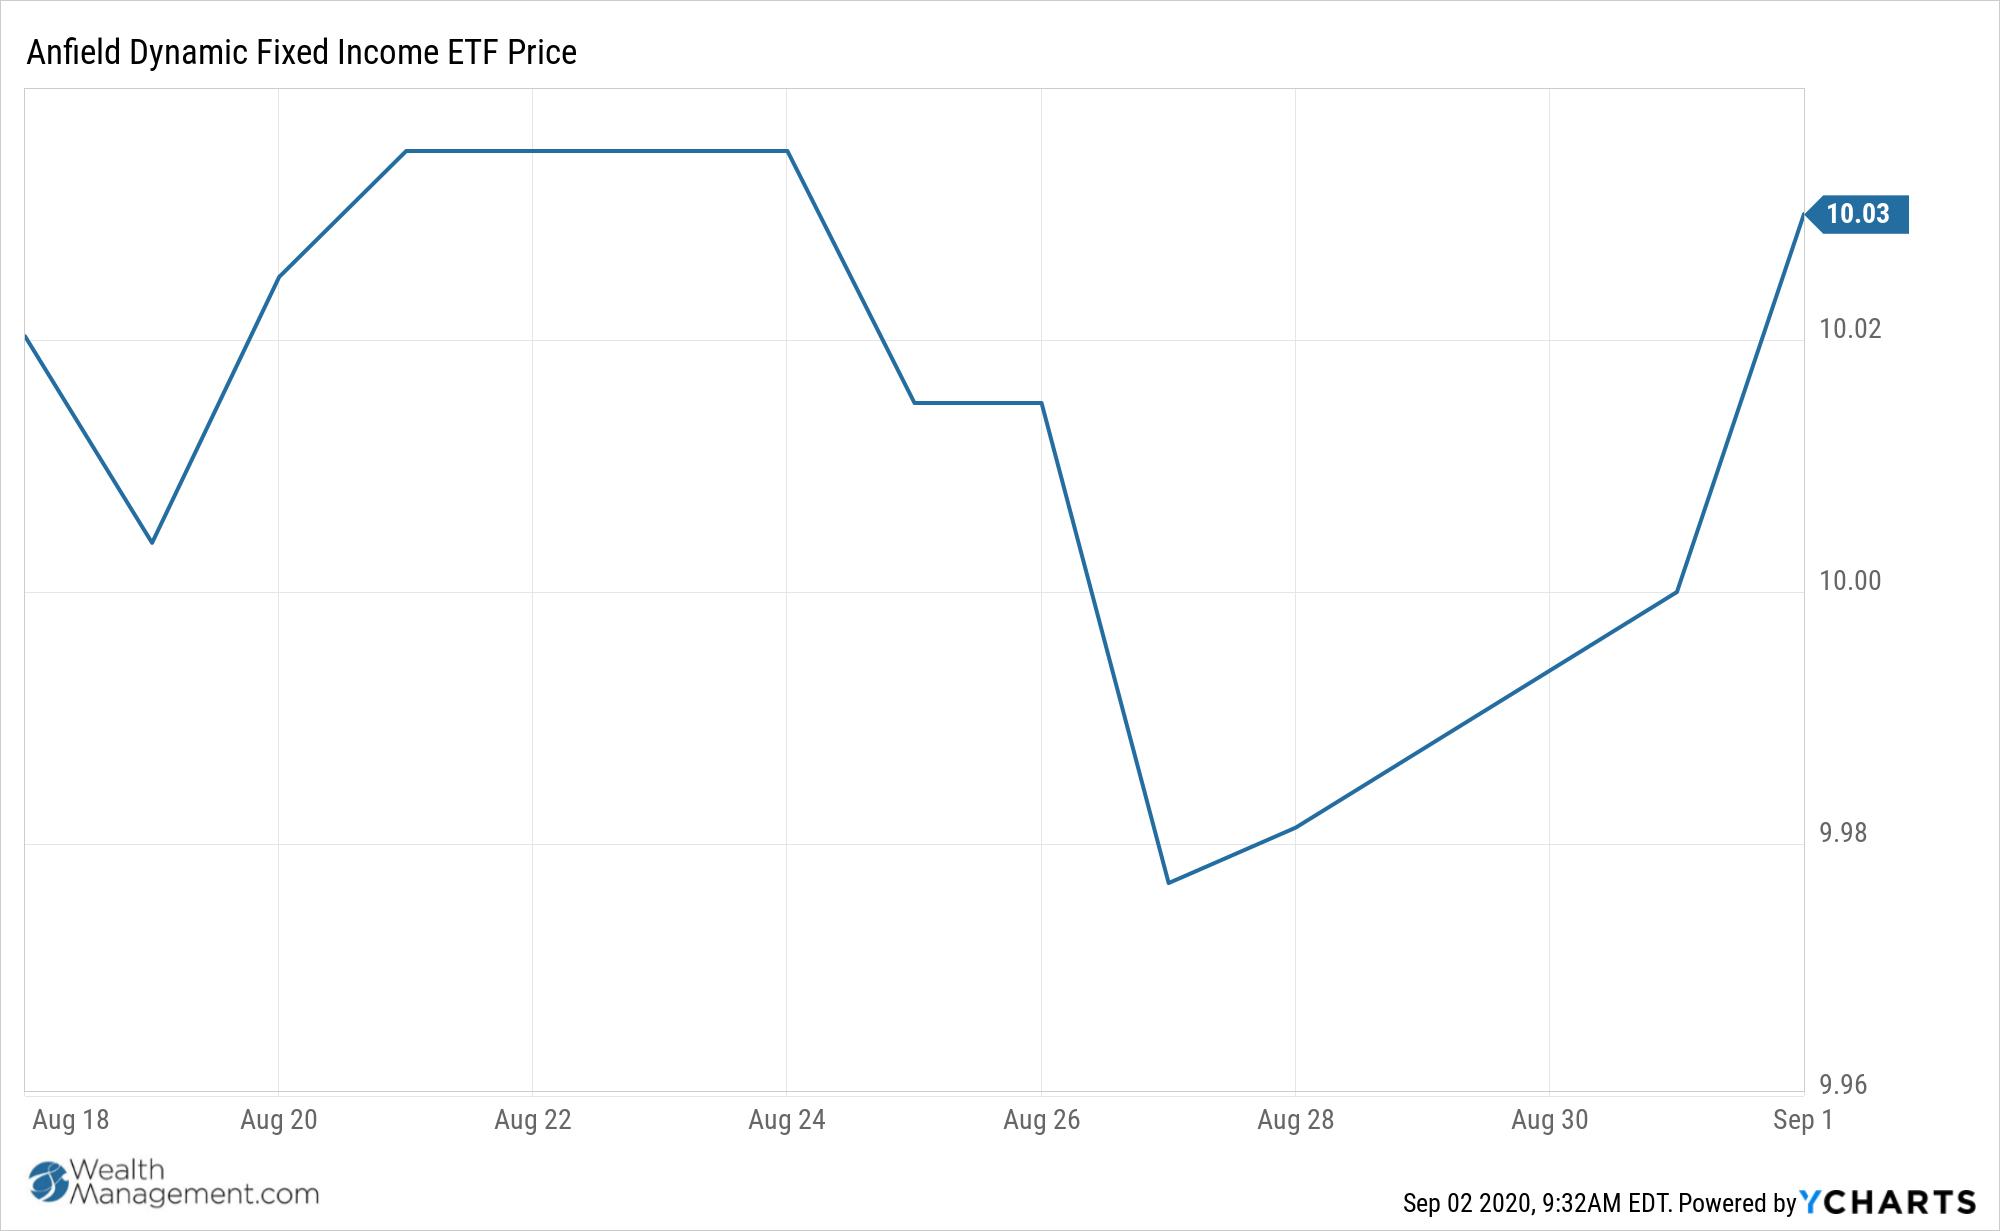 ADFI Chart